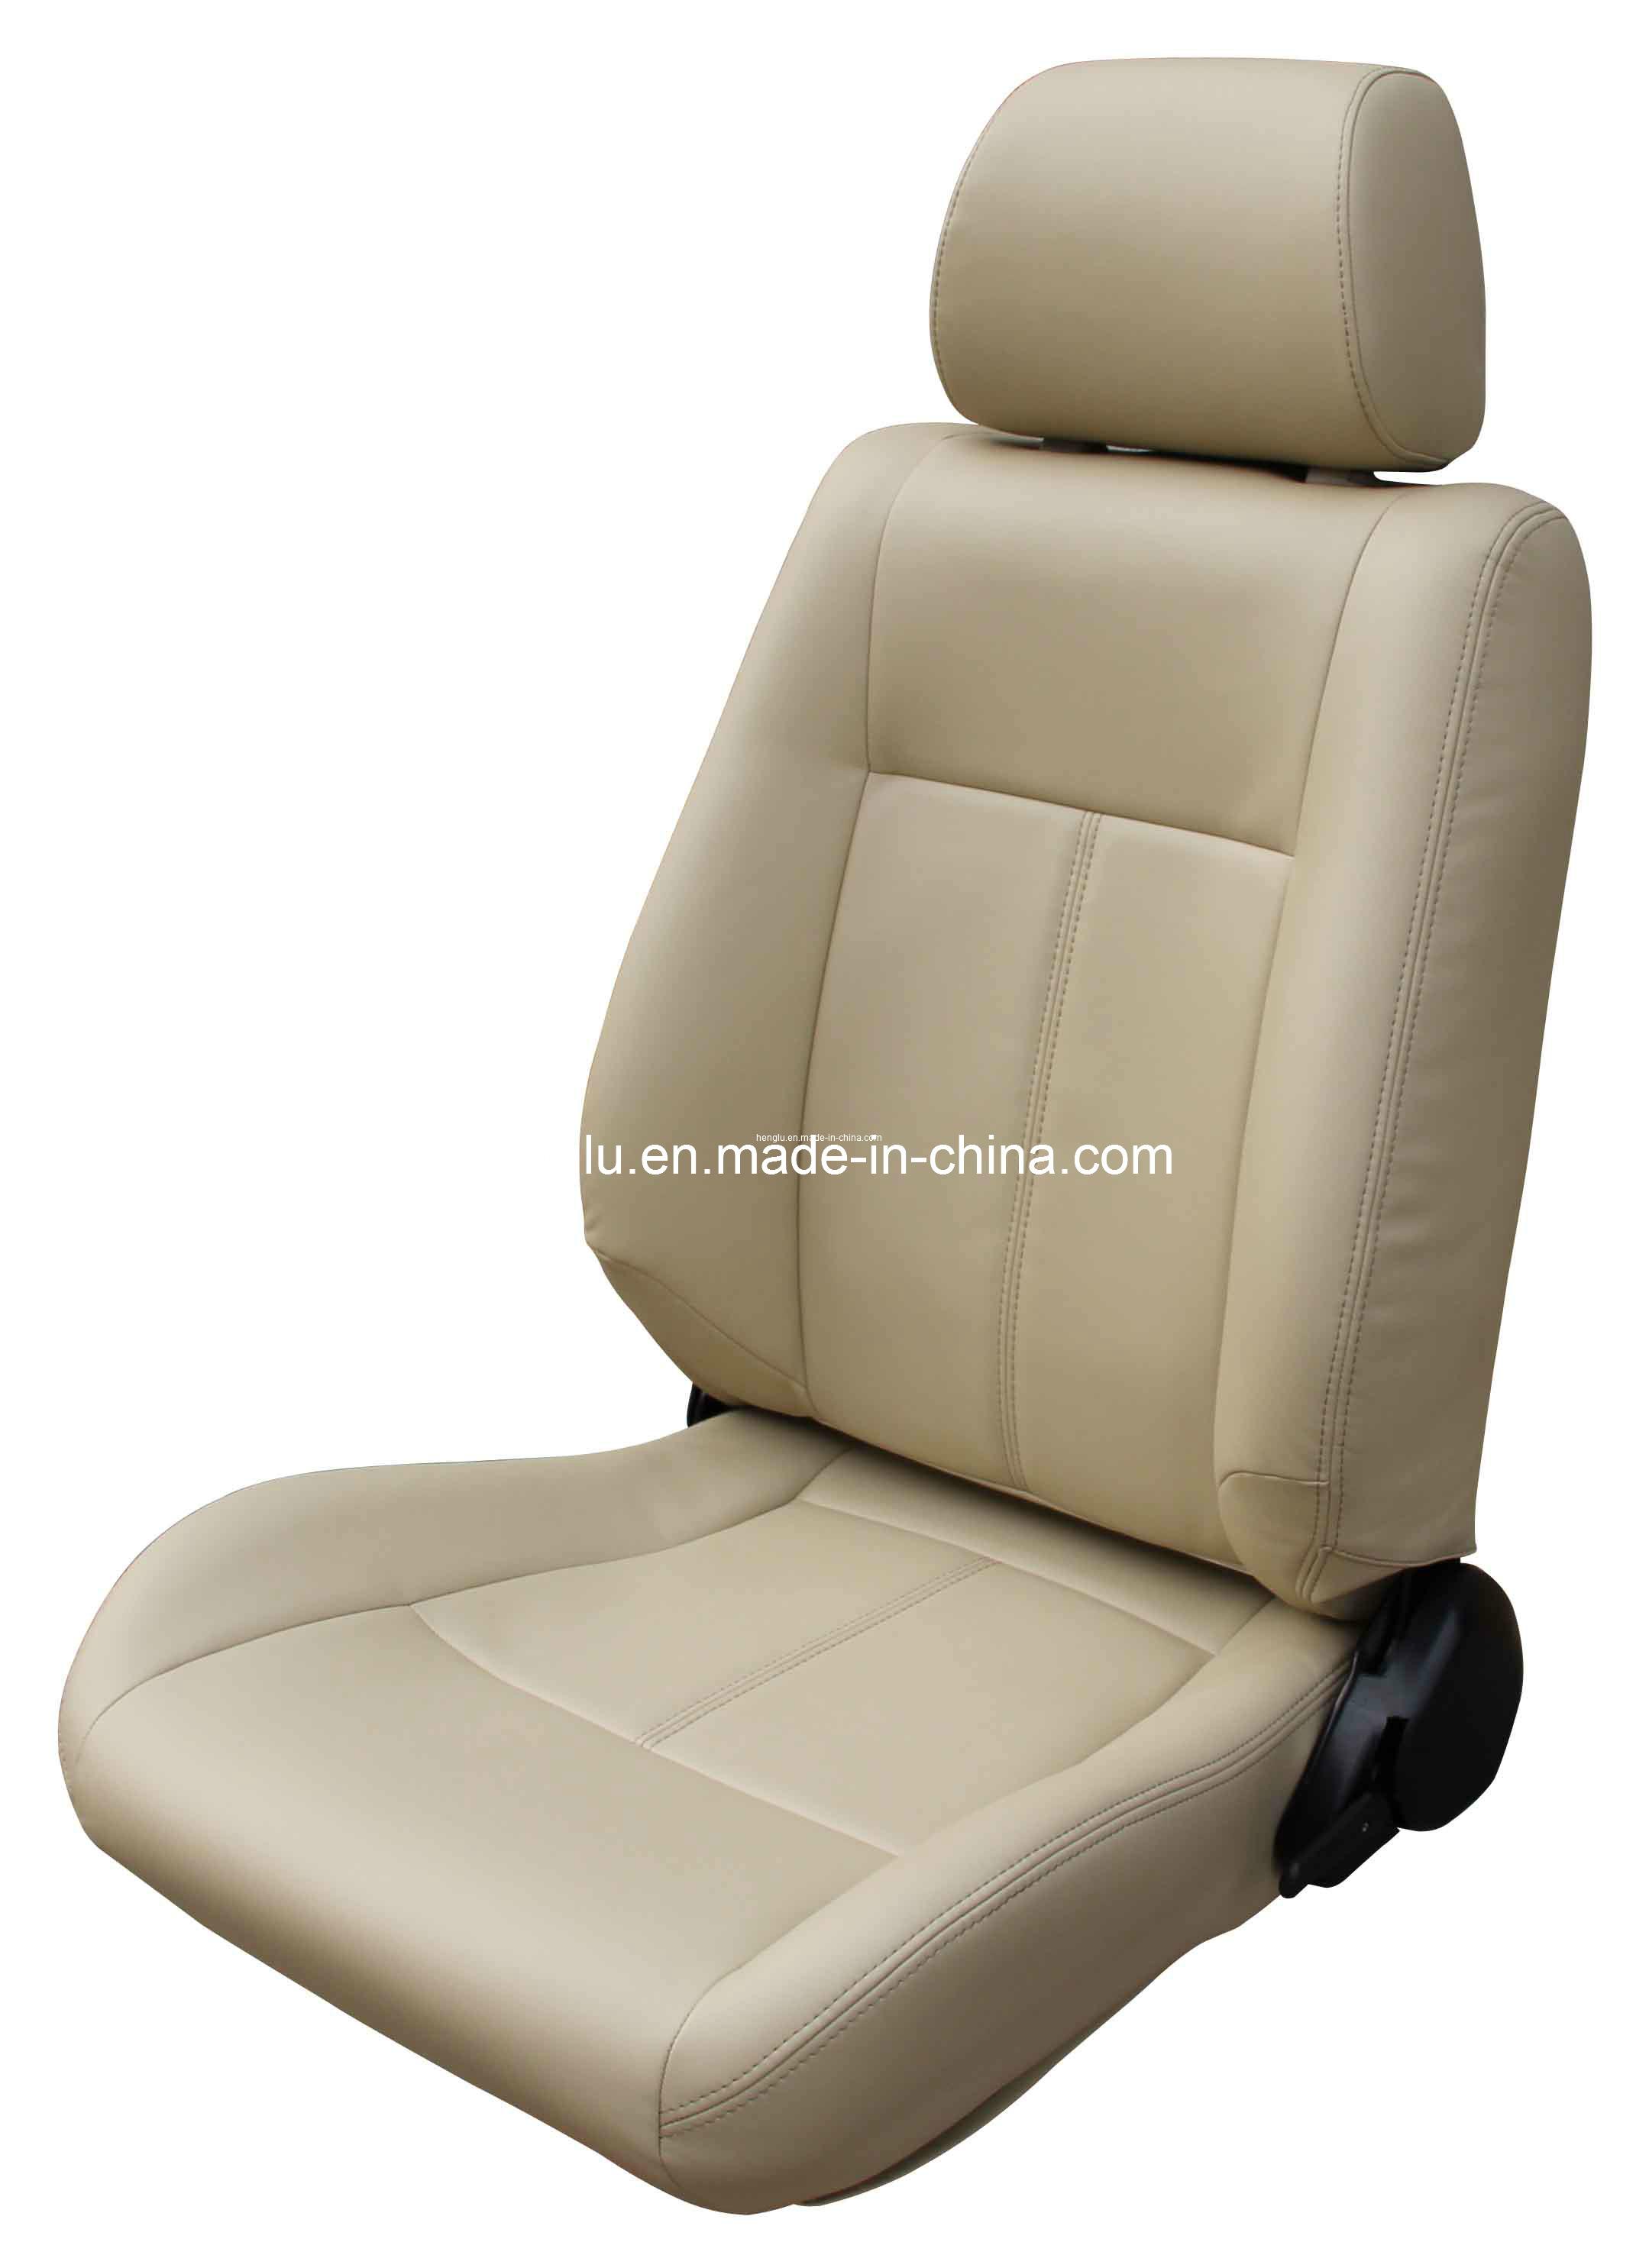 Hot Sales Land Crusier OEM Racing Car Seat